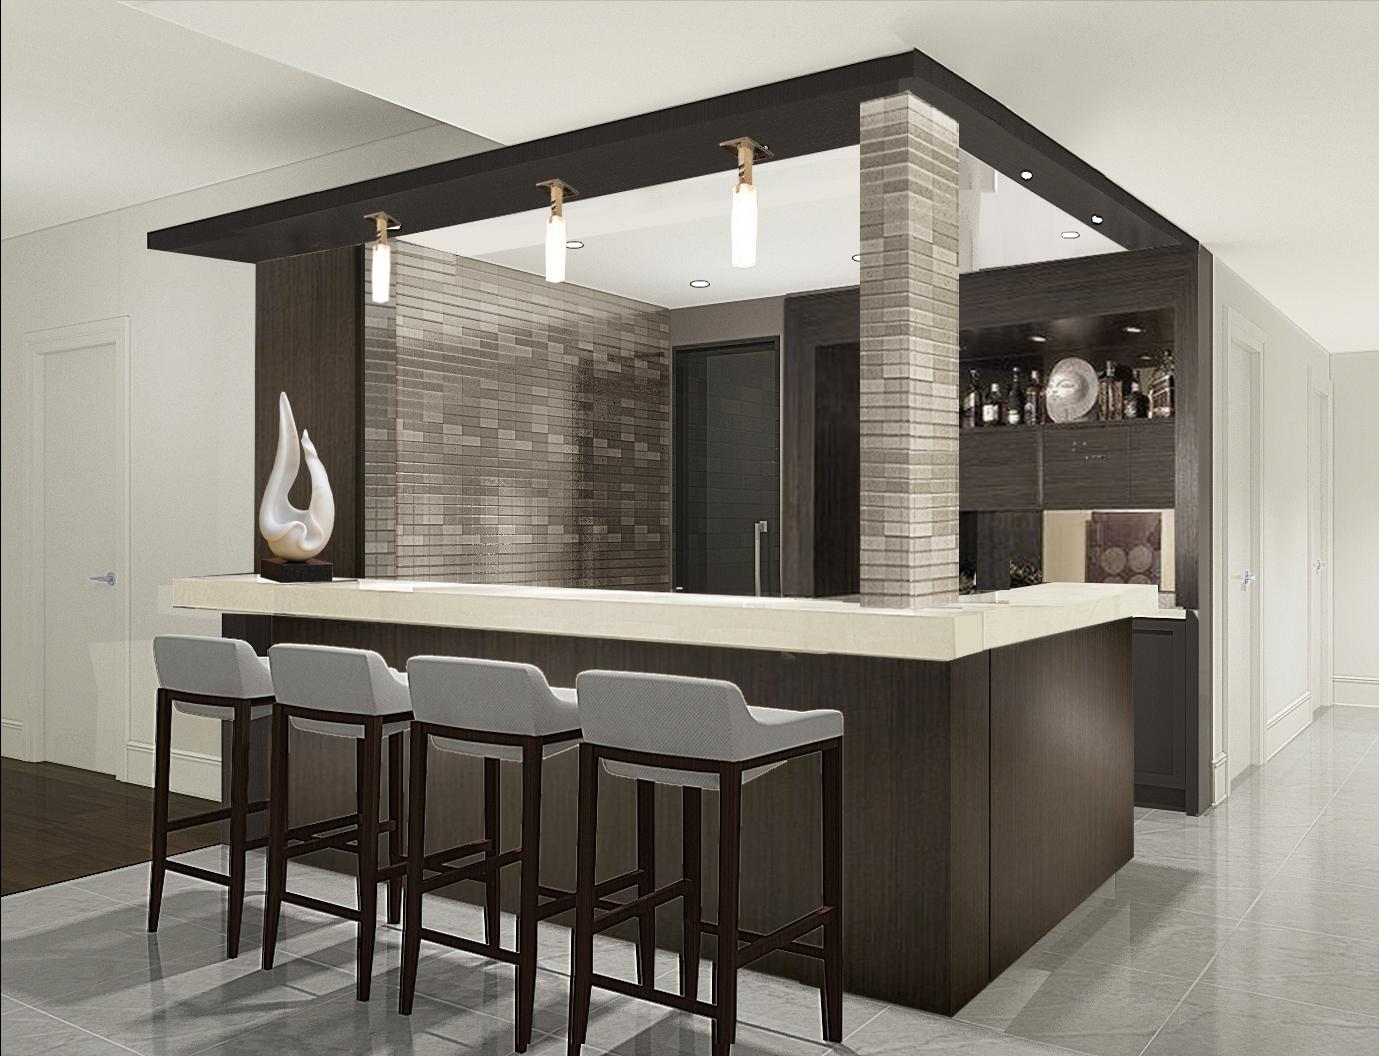 XL Design _ bar rendering